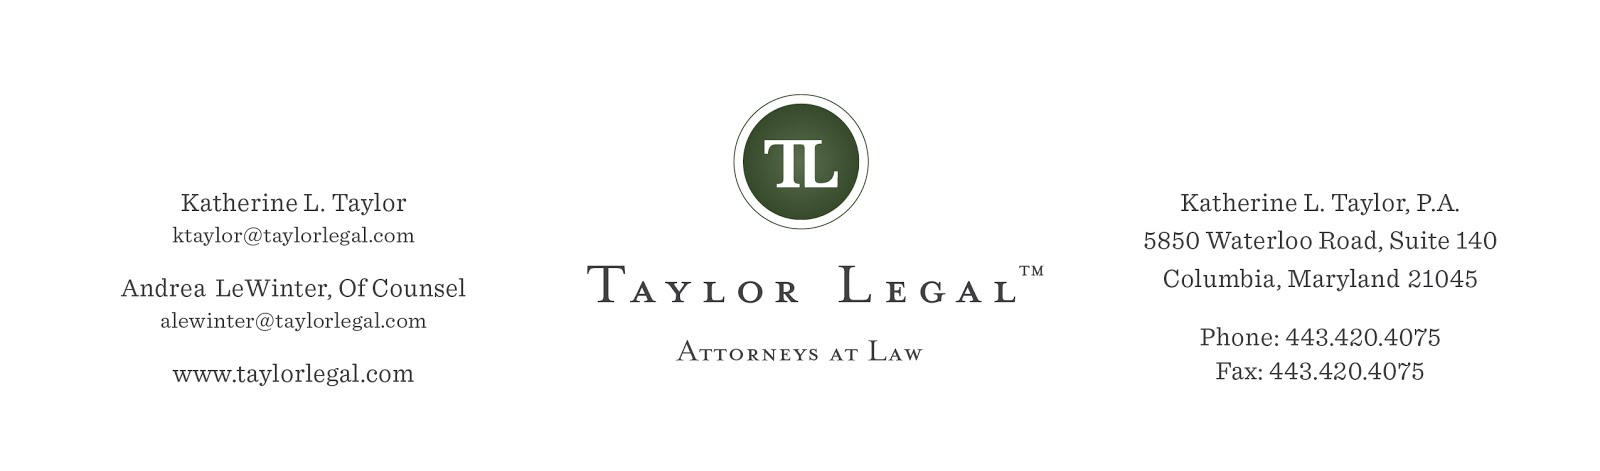 Taylor Legal™